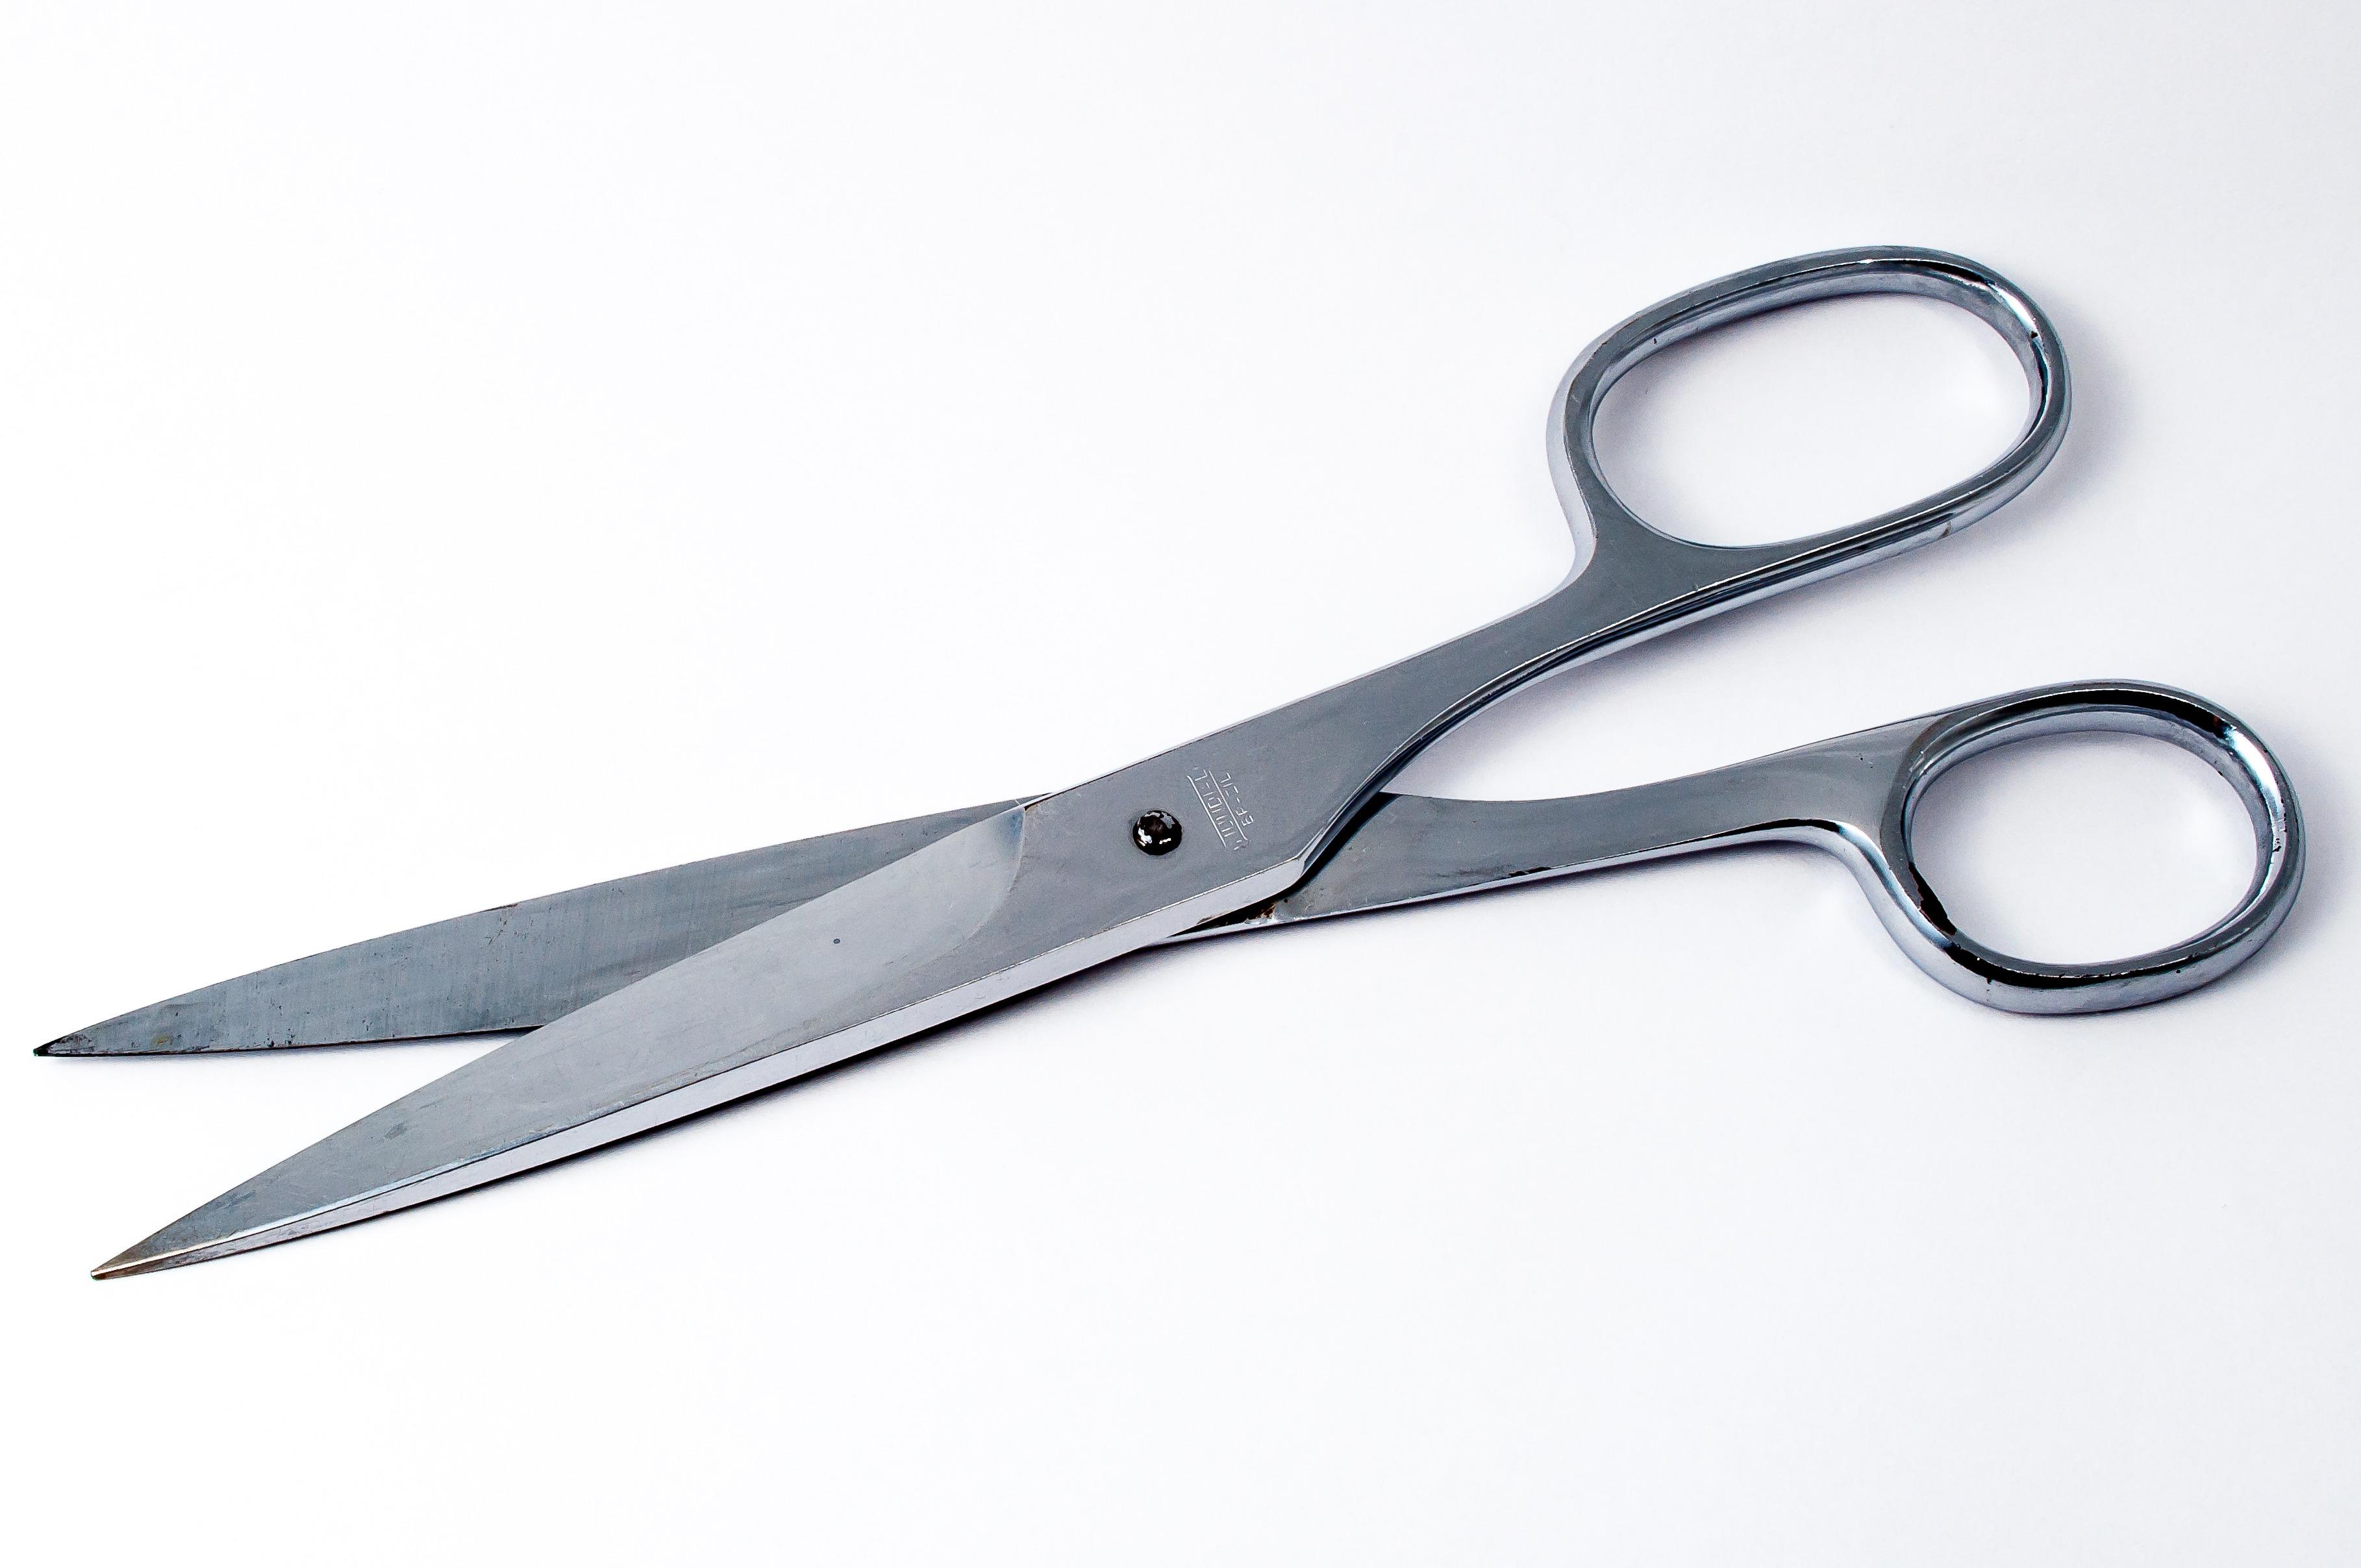 tool-metal-office-cut-propeller-scissors-1105274